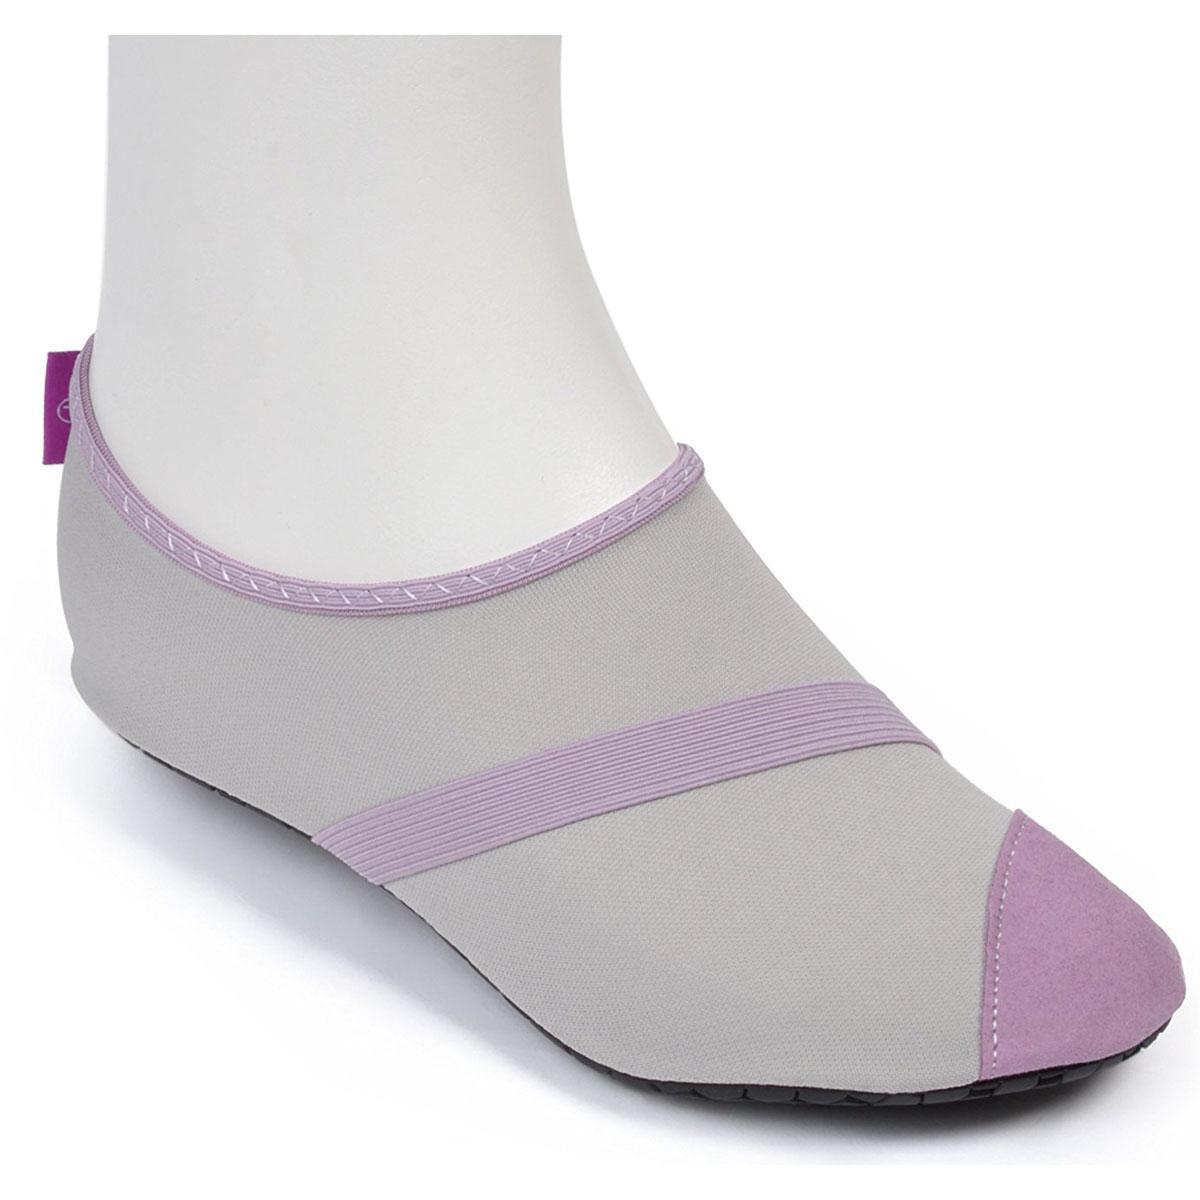 FitKicks-Women-039-s-Non-Slip-Sole-Active-Footwear thumbnail 25